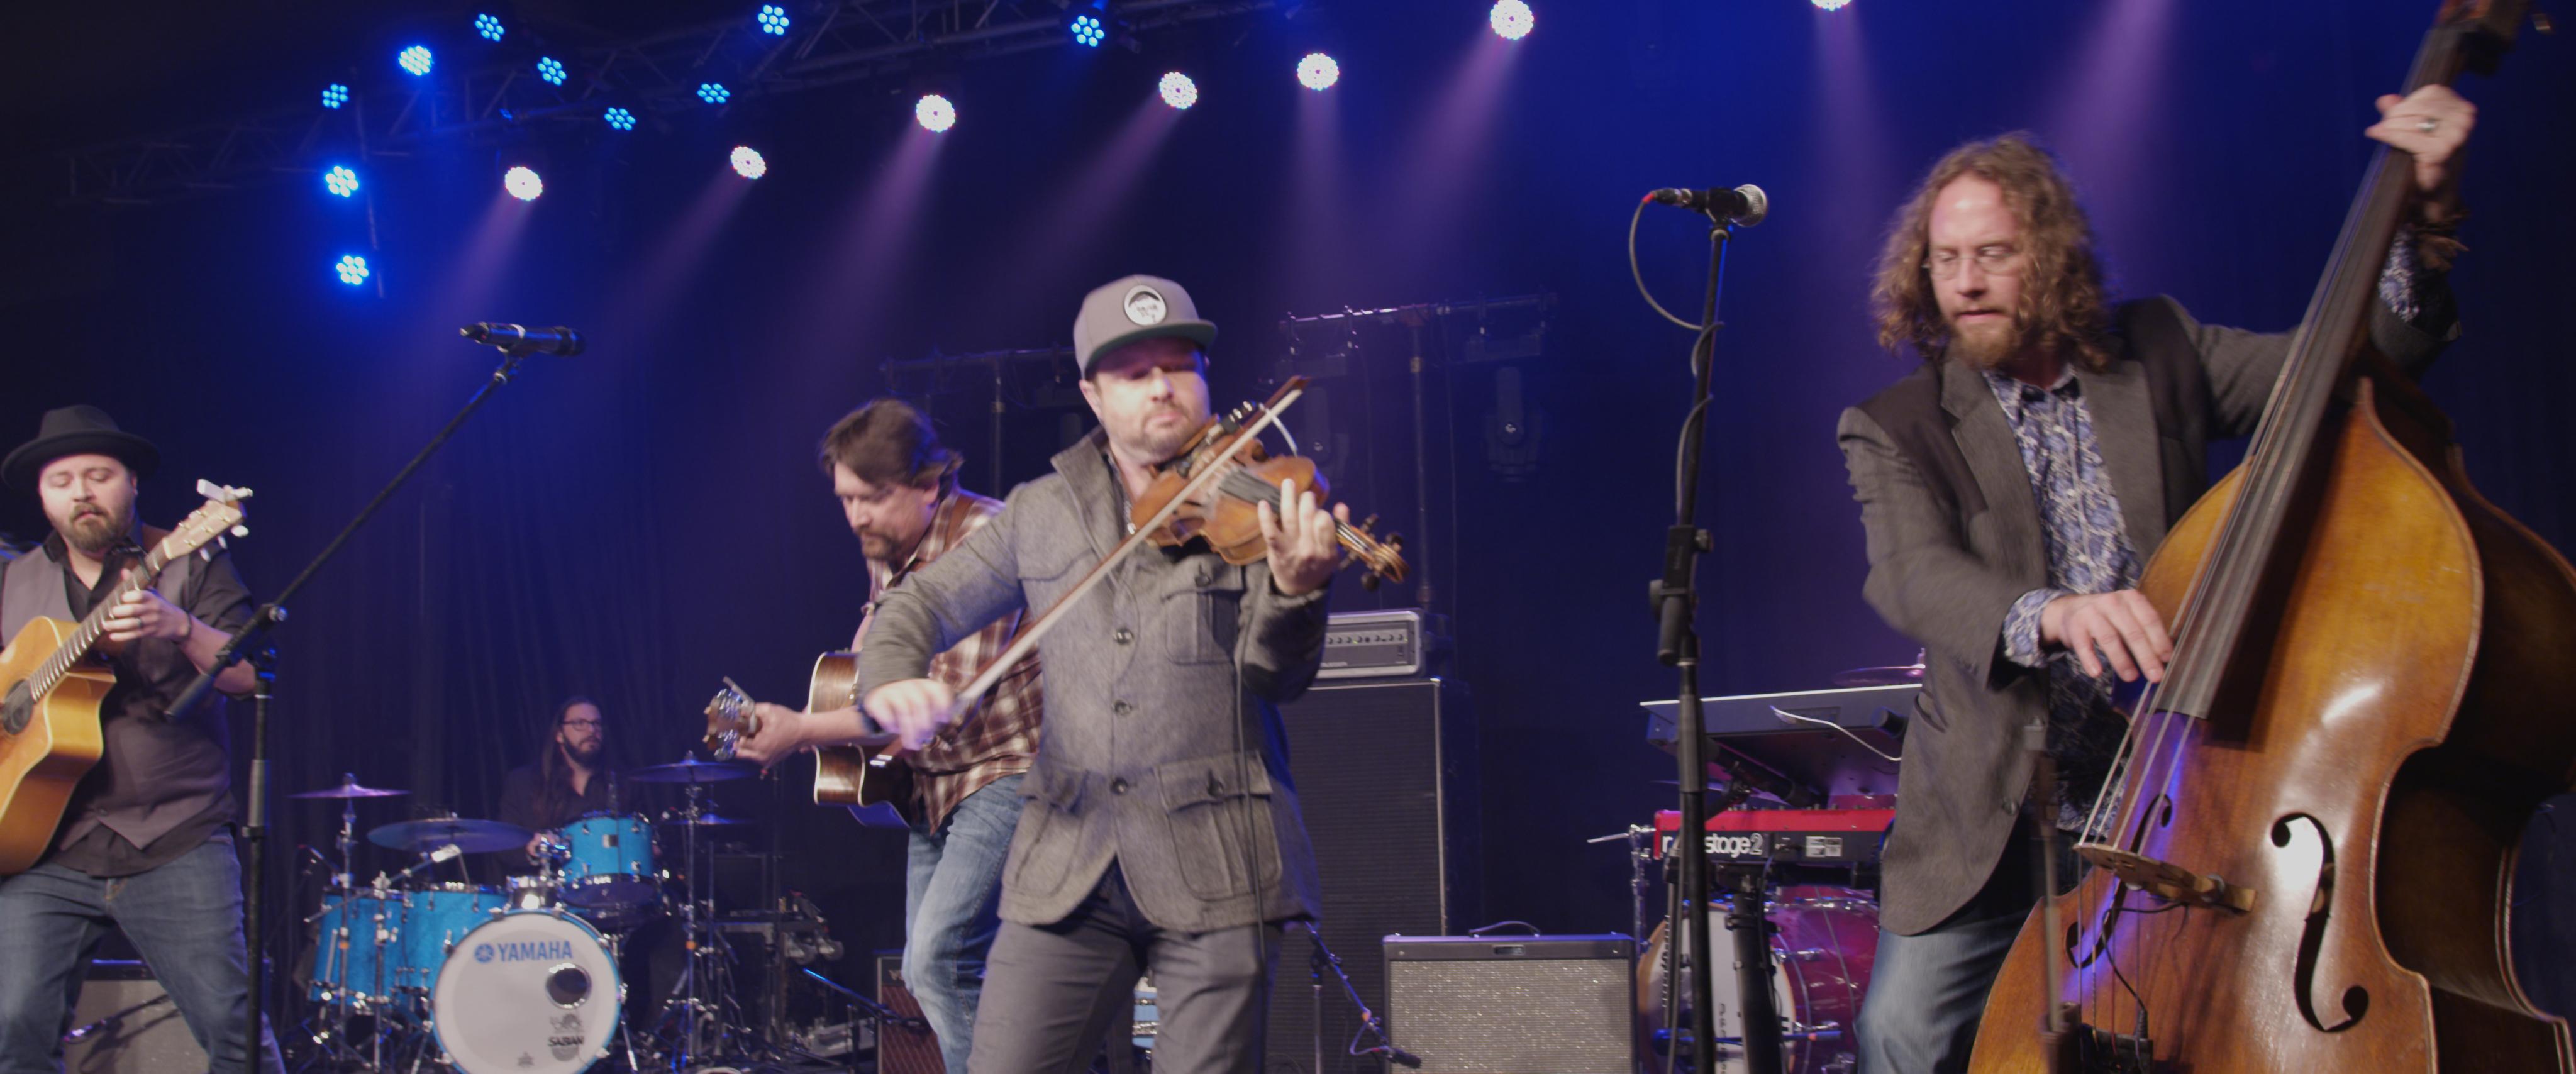 Blake Reid Band - 2017 ACMA's 29